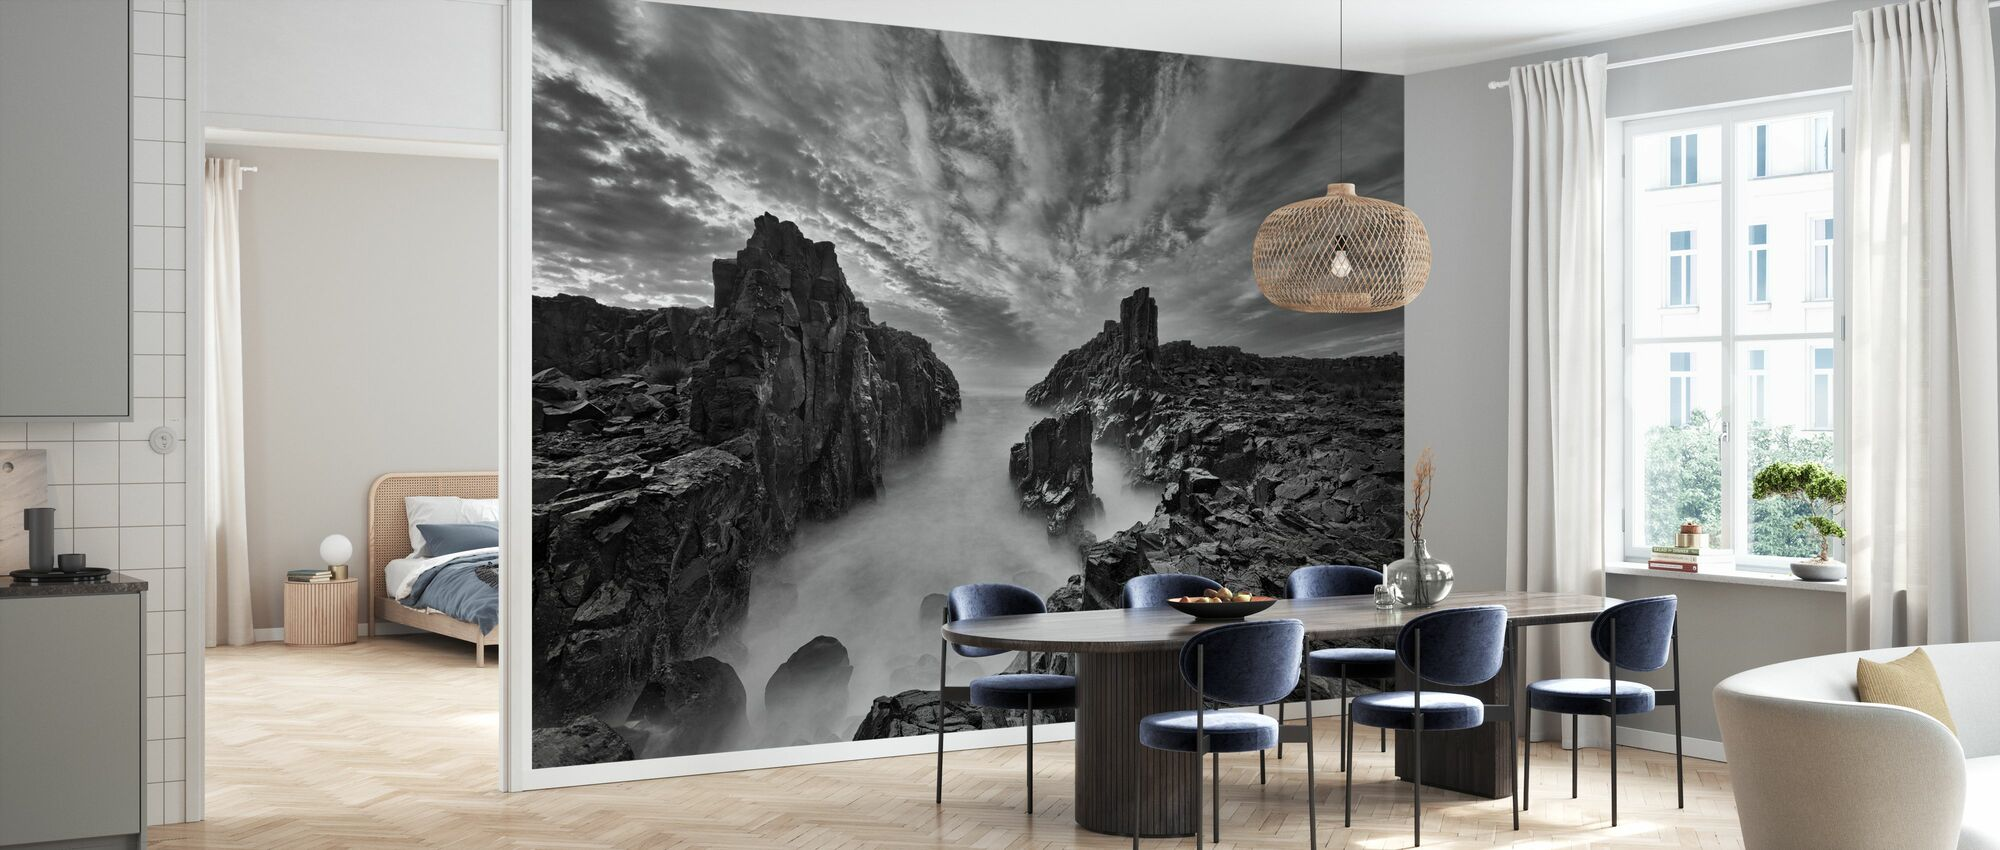 Gate to Heaven - Wallpaper - Kitchen